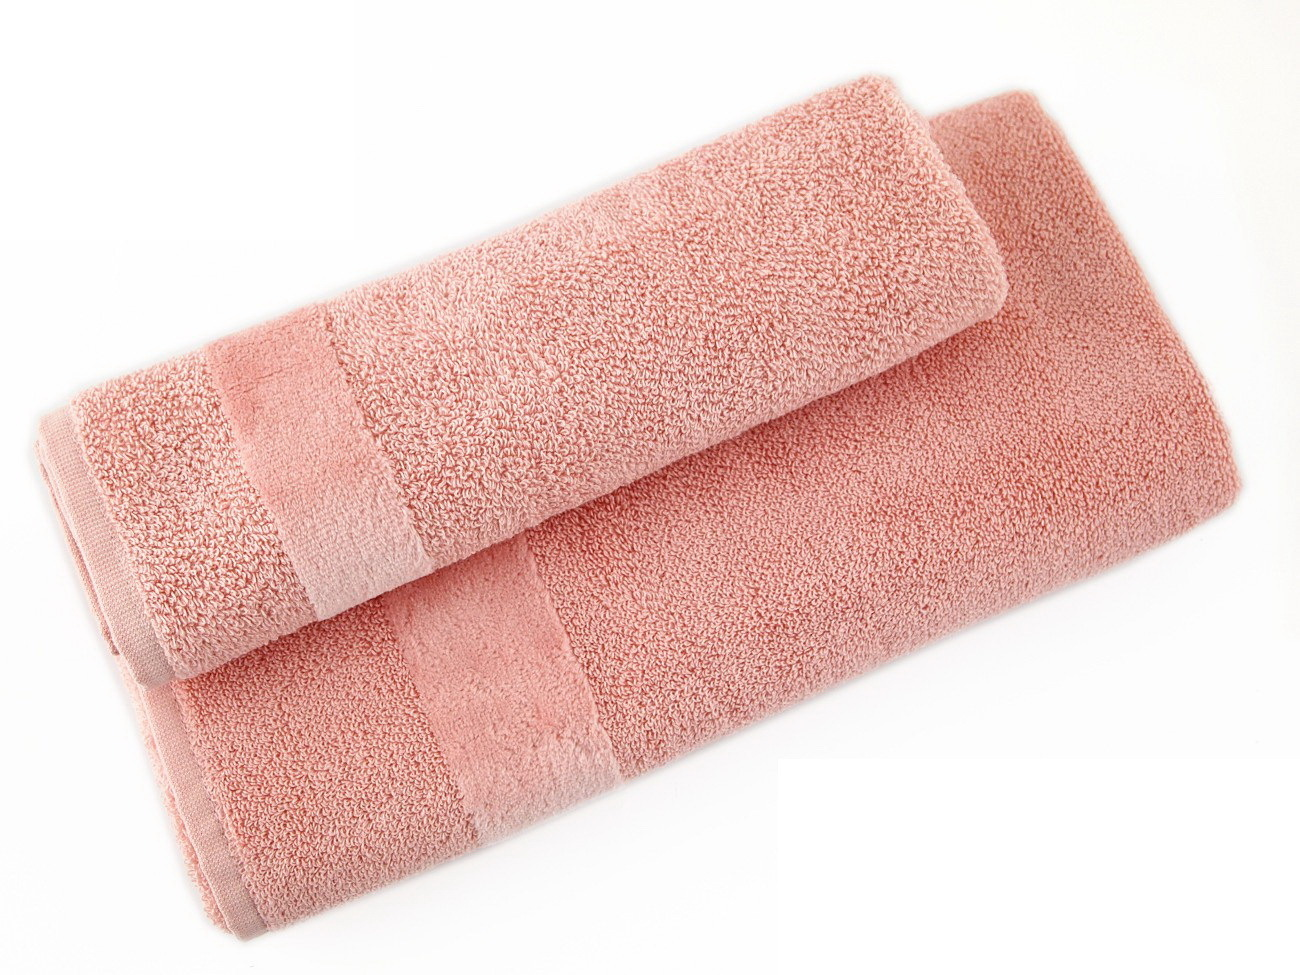 Наборы полотенец Набор полотенец 3 шт Carrara Fyber светло-розовый elitnye-polotentsa-mahrovye-fyber-504-svetlo-rozovye-ot-carrara-italiya.JPG